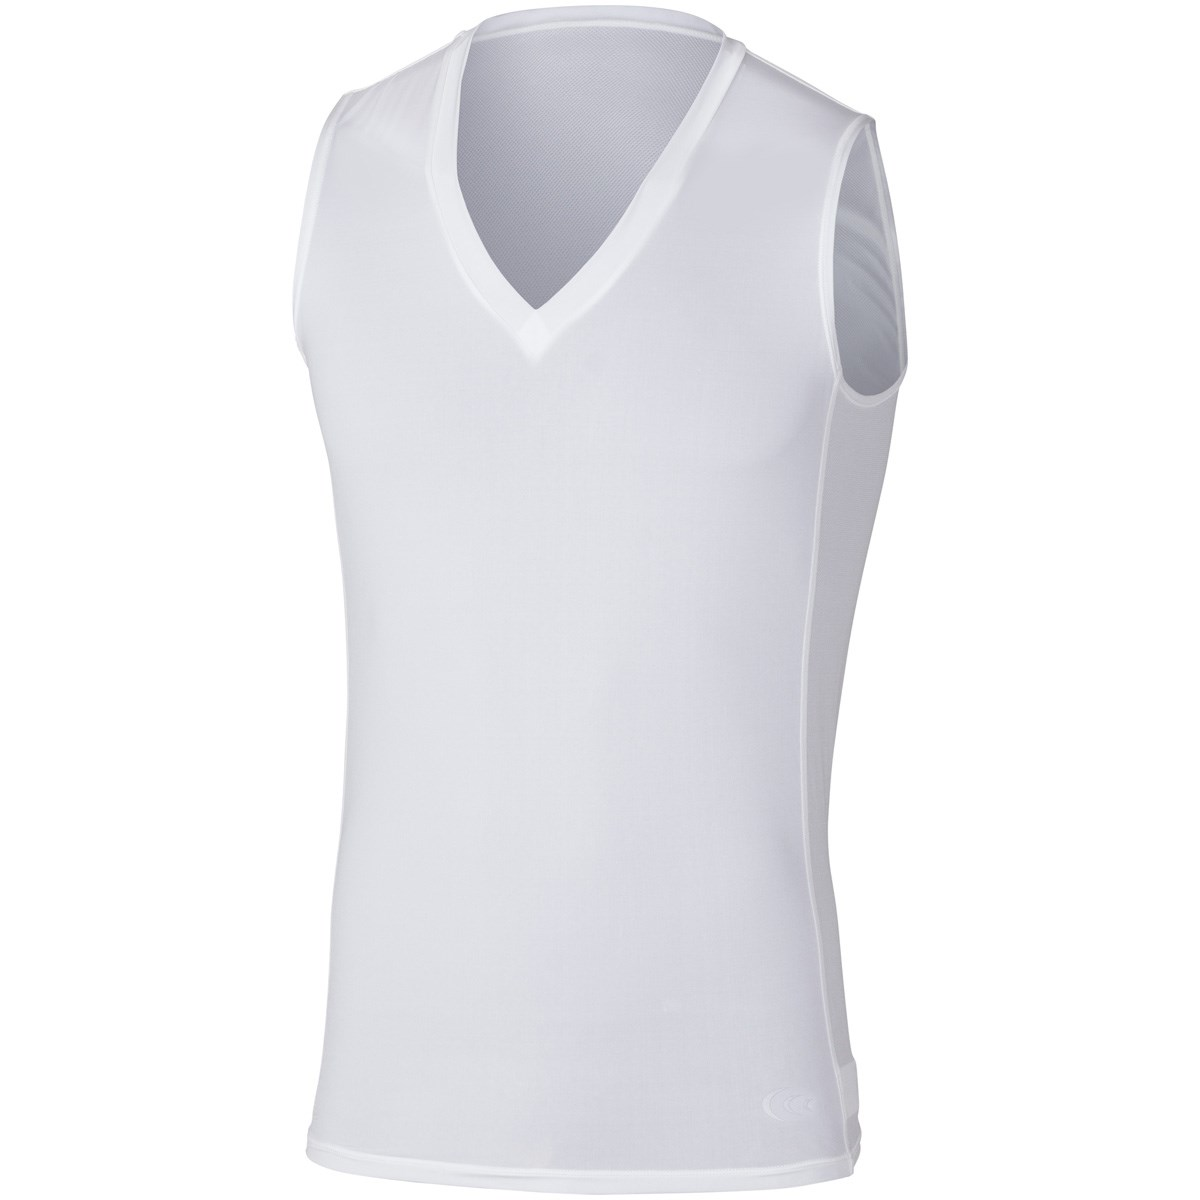 C3fit C3fit クーリングVネックスリーブレスアンダーシャツ M ホワイト